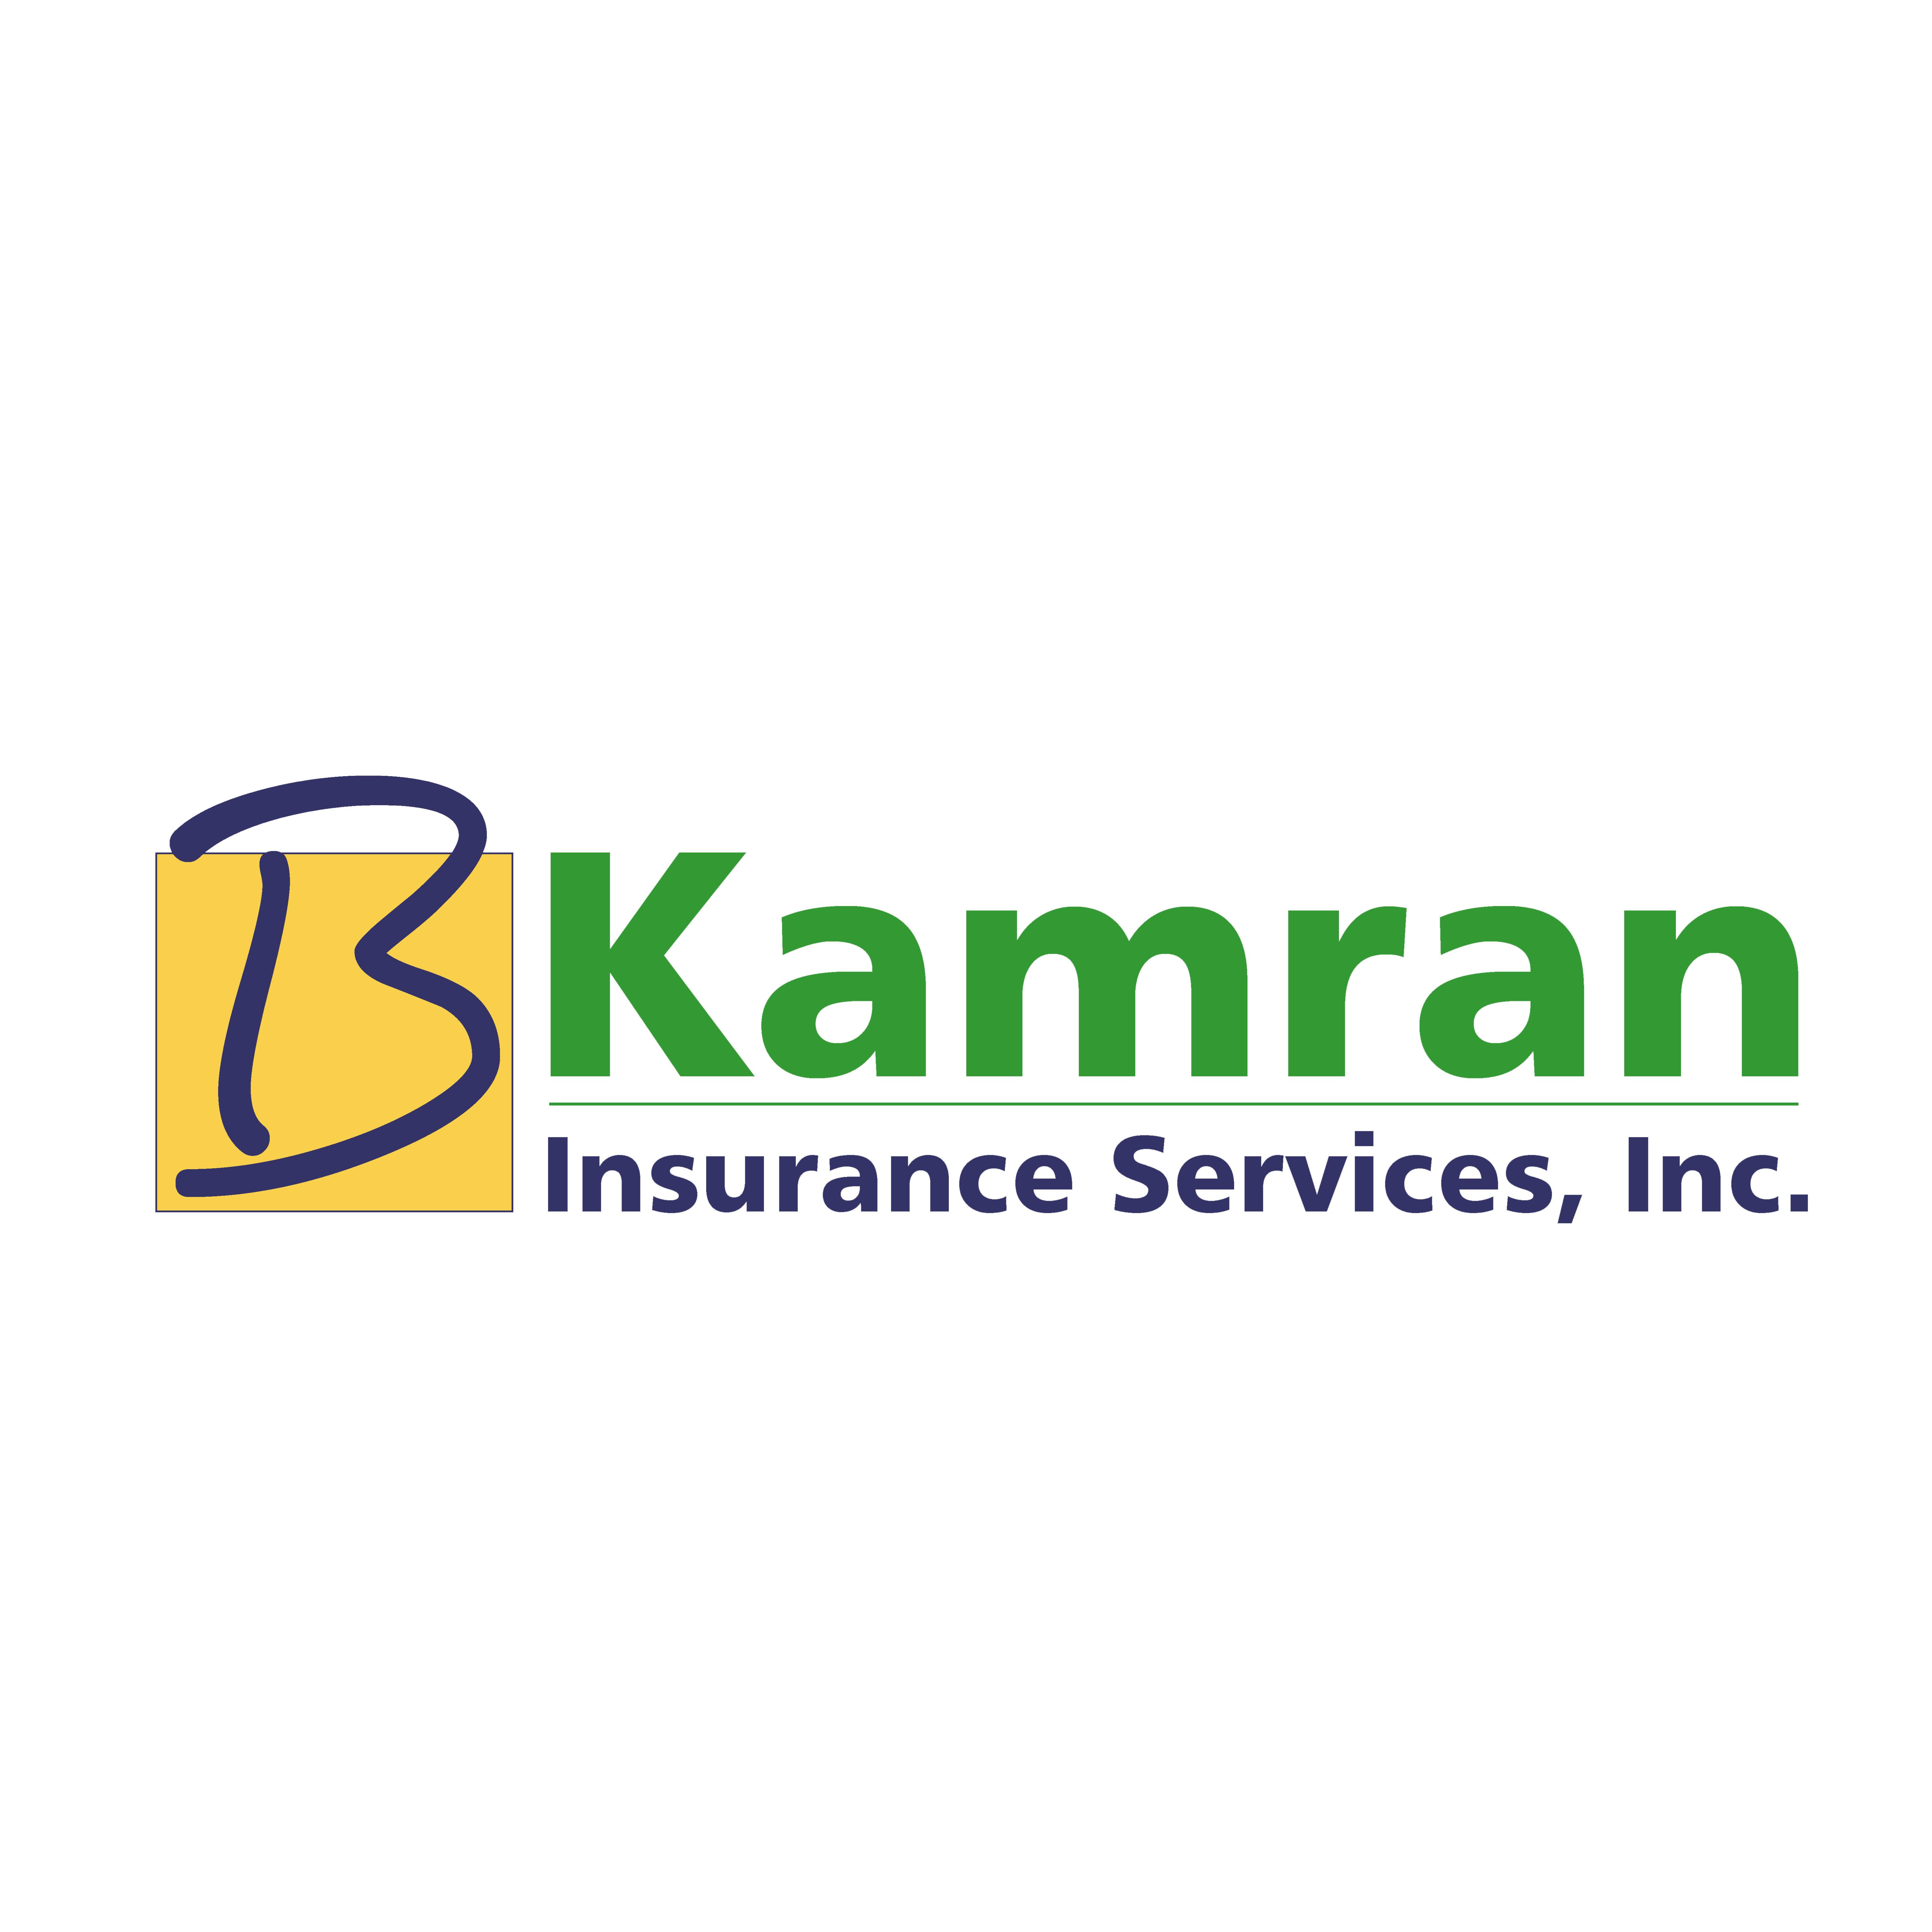 B Kamran Insurance Services, Inc.